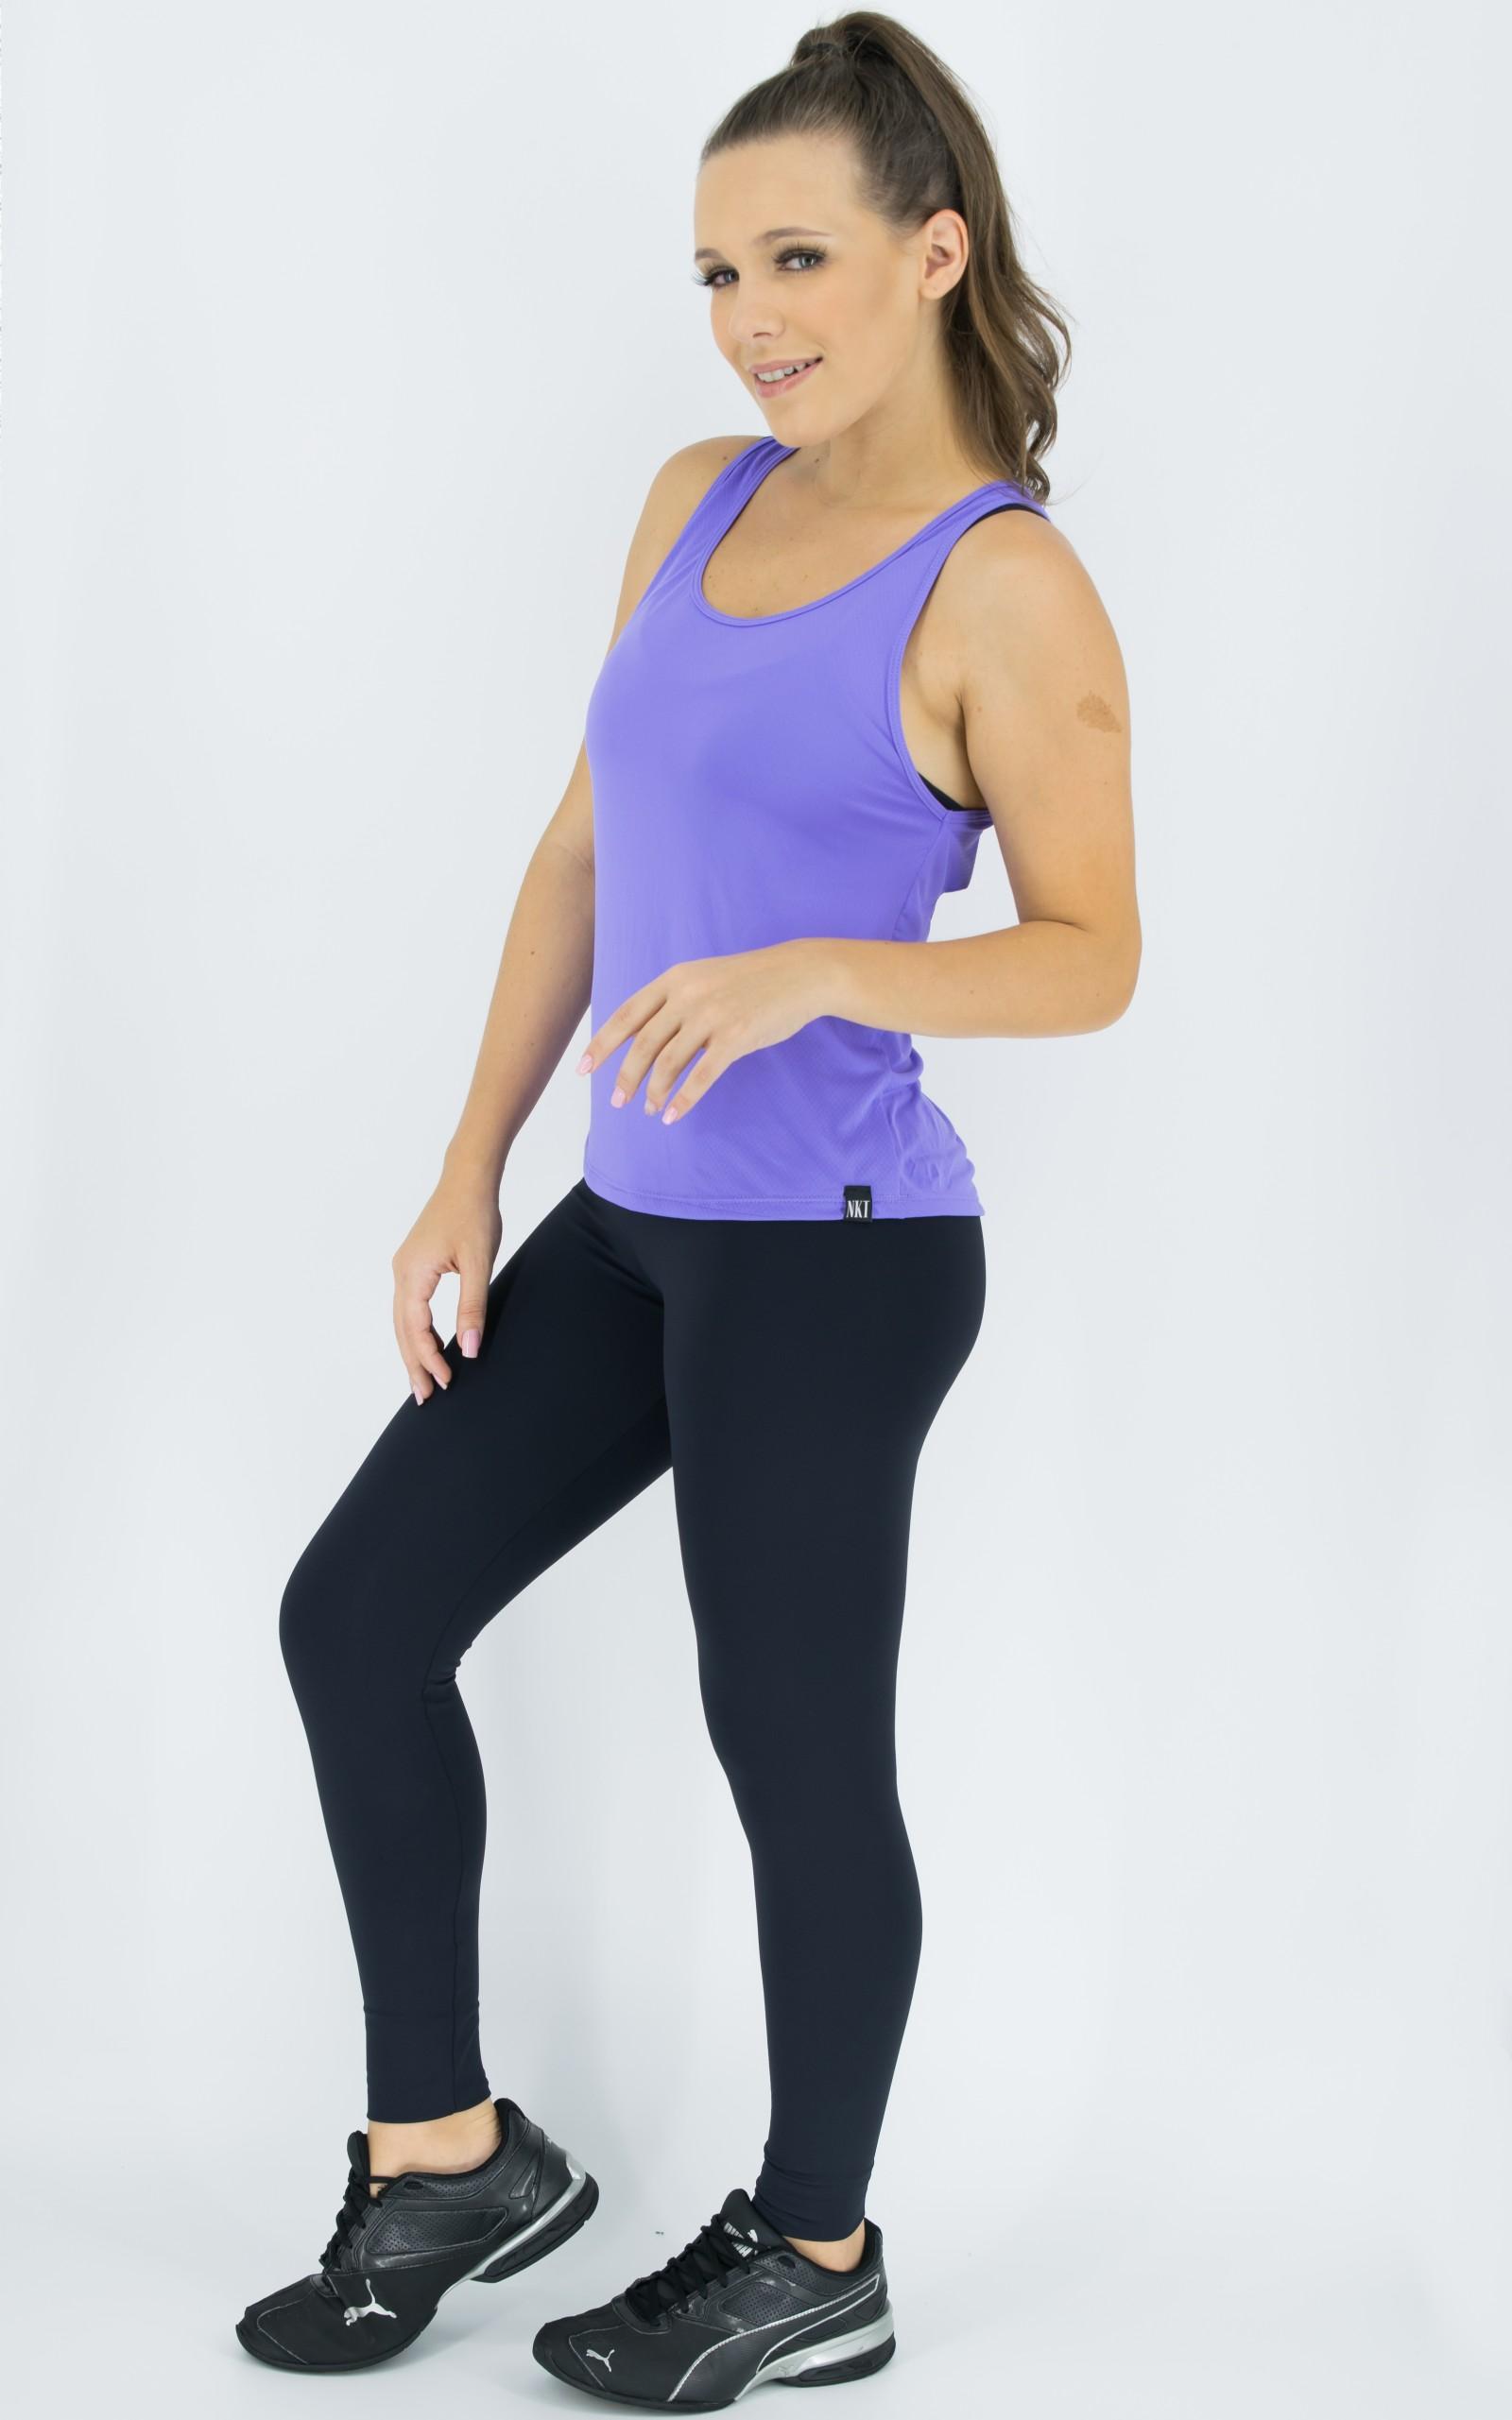 Regata Lux Lilás, Coleção Move Your Body - NKT Fitwear Moda Fitness